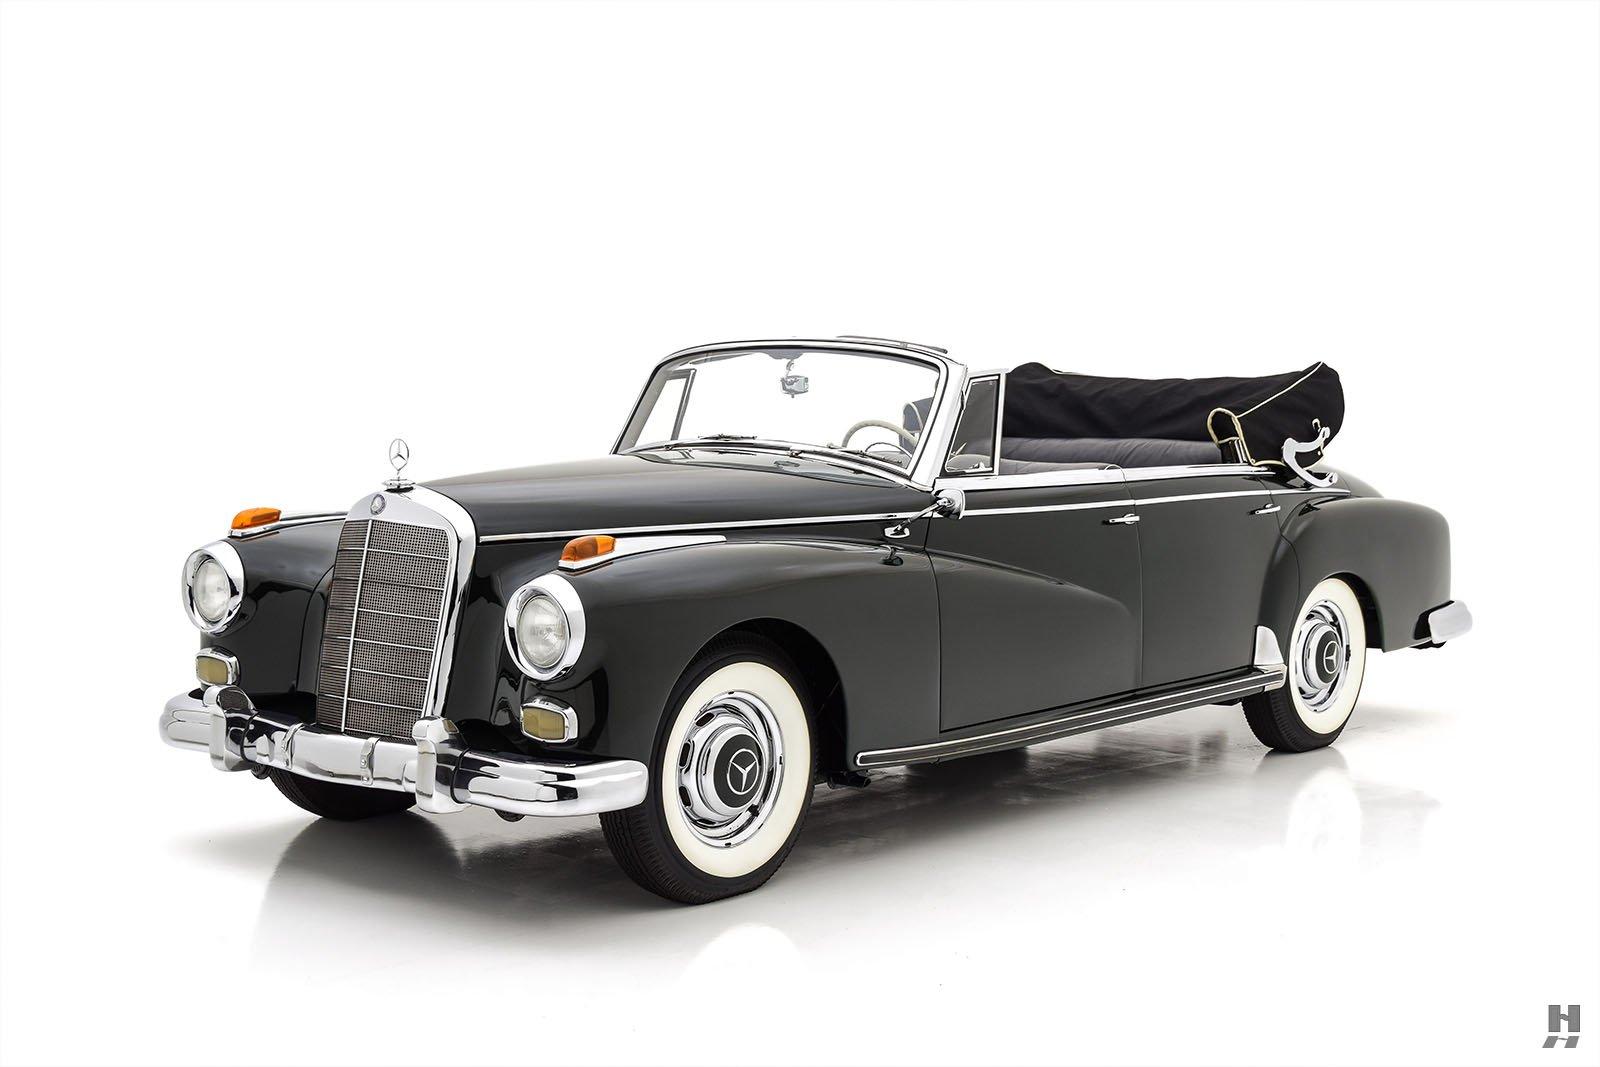 1959 Mercedes-Benz 300d Cabriolet D For Sale at Hyman TD